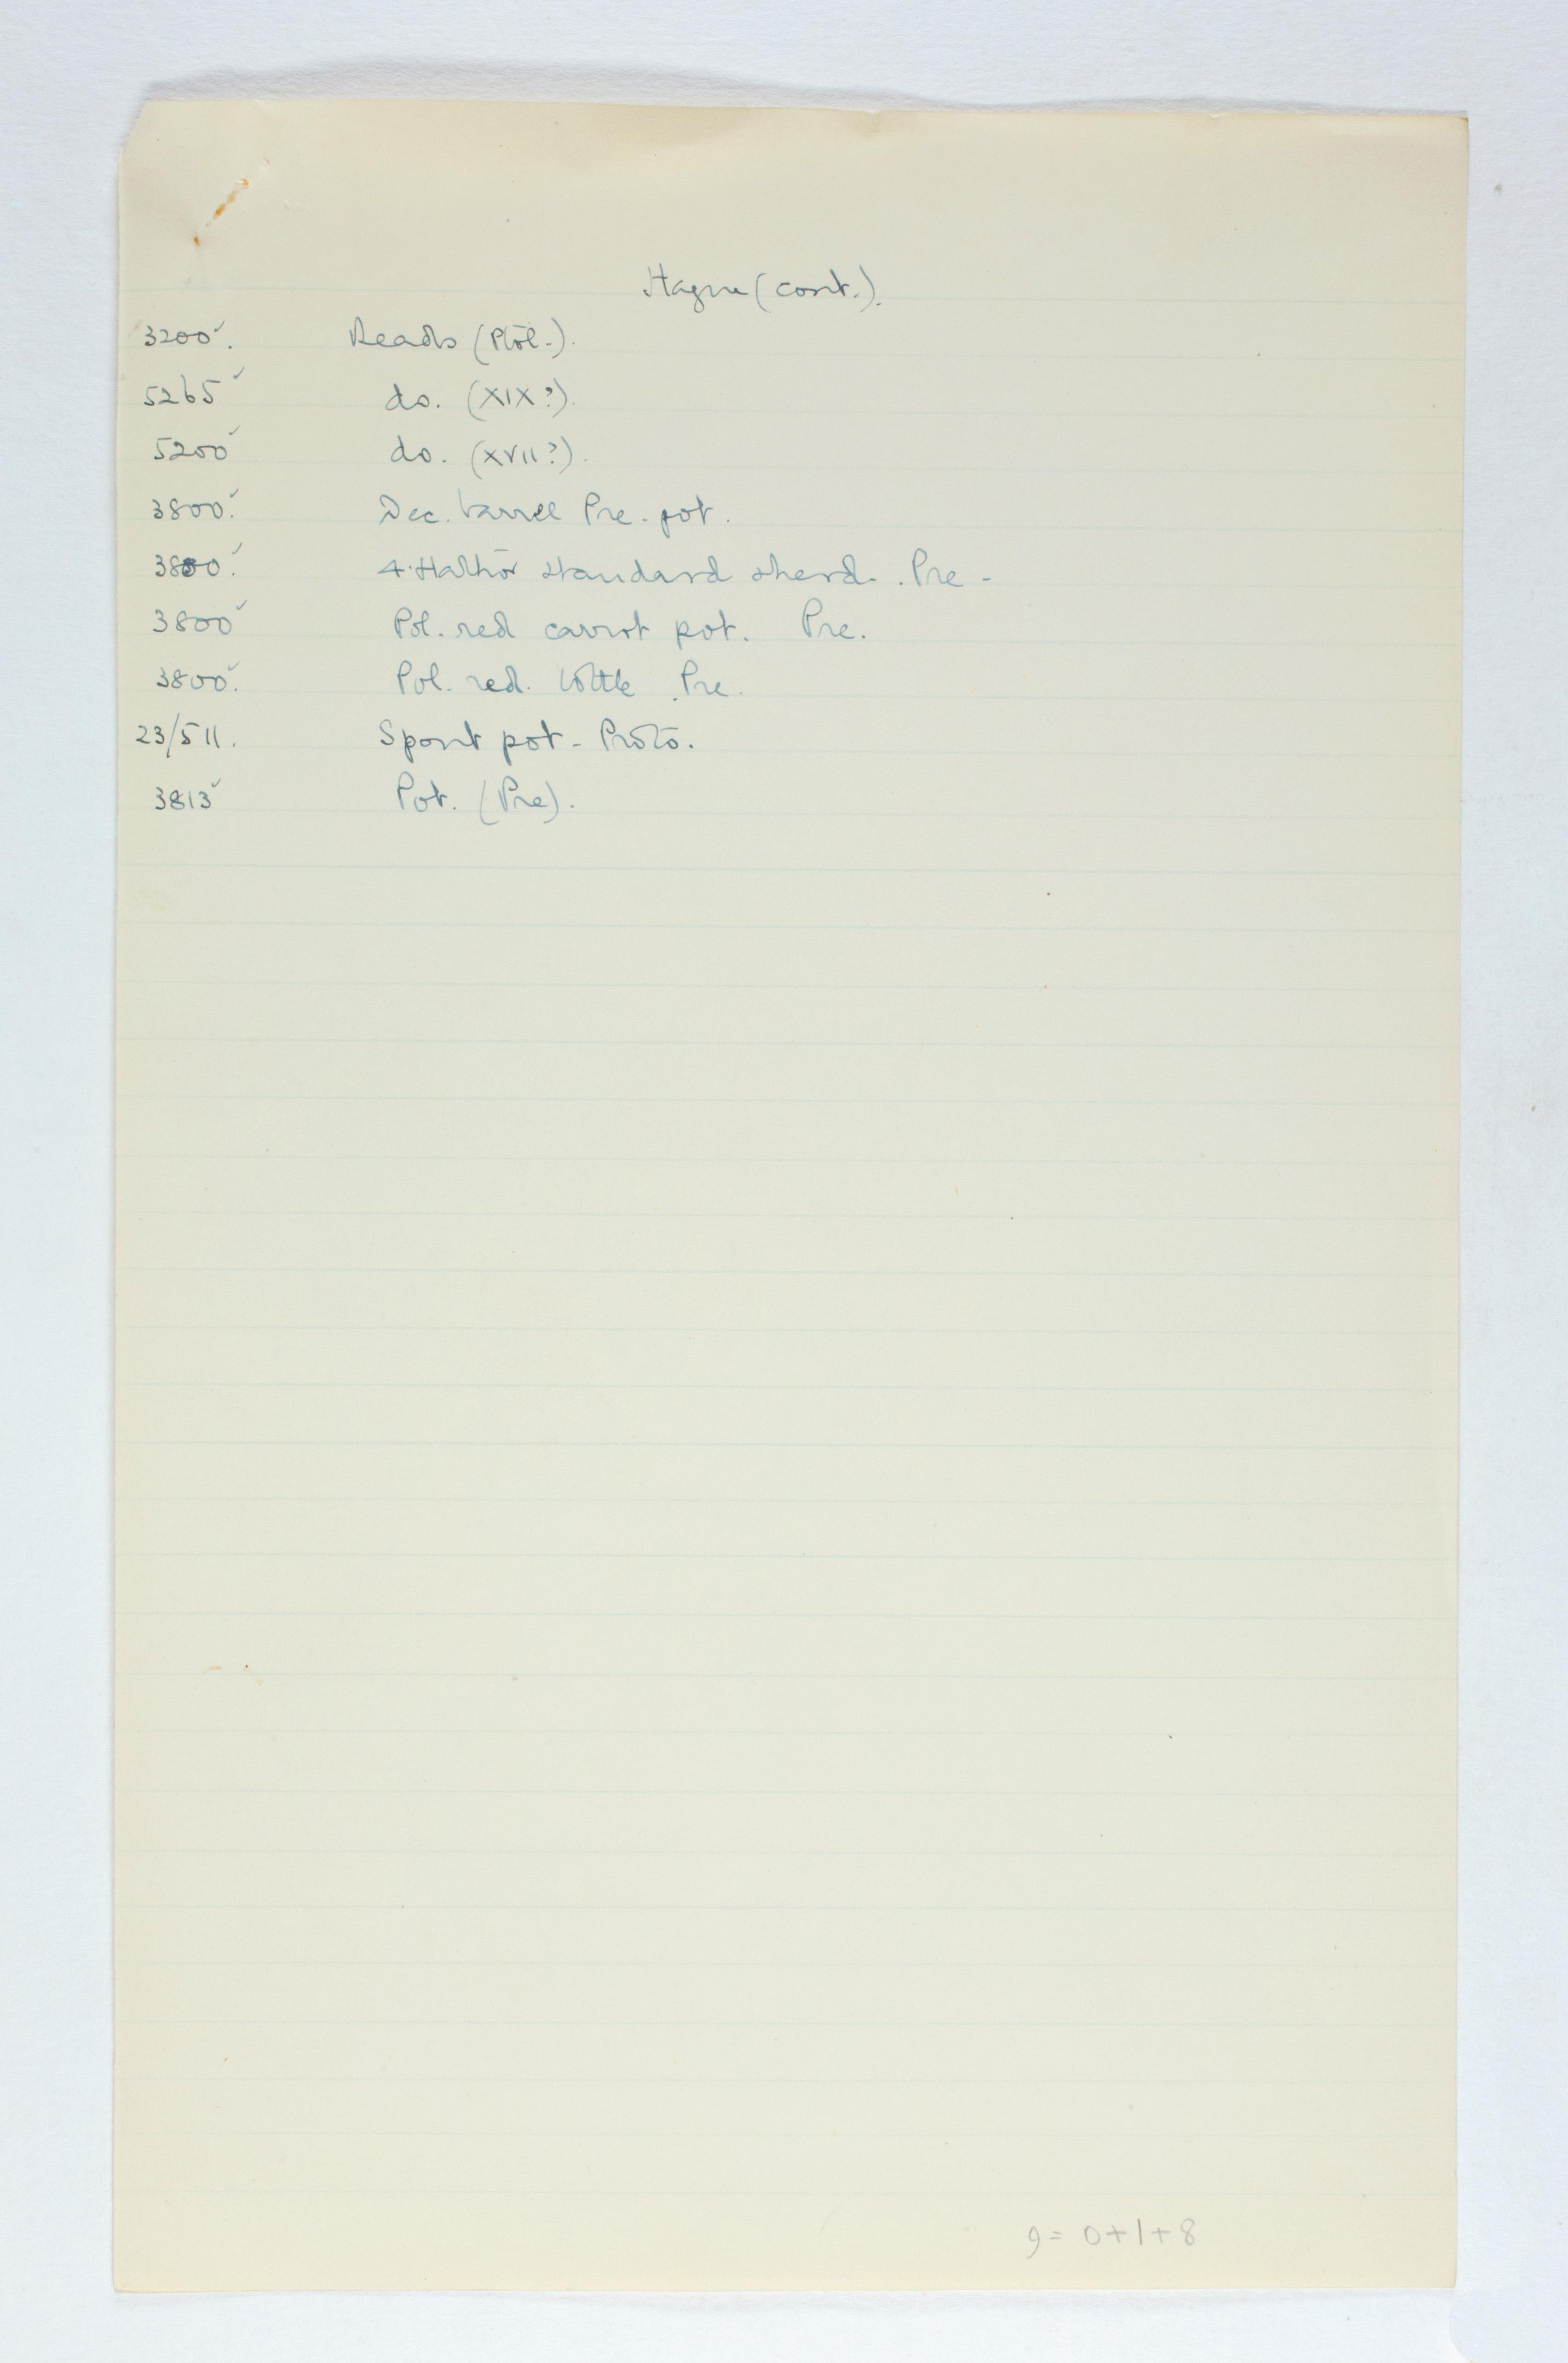 1923-24 Qau el-Kebir, Hemamieh Individual institution list PMA/WFP1/D/27/12.3